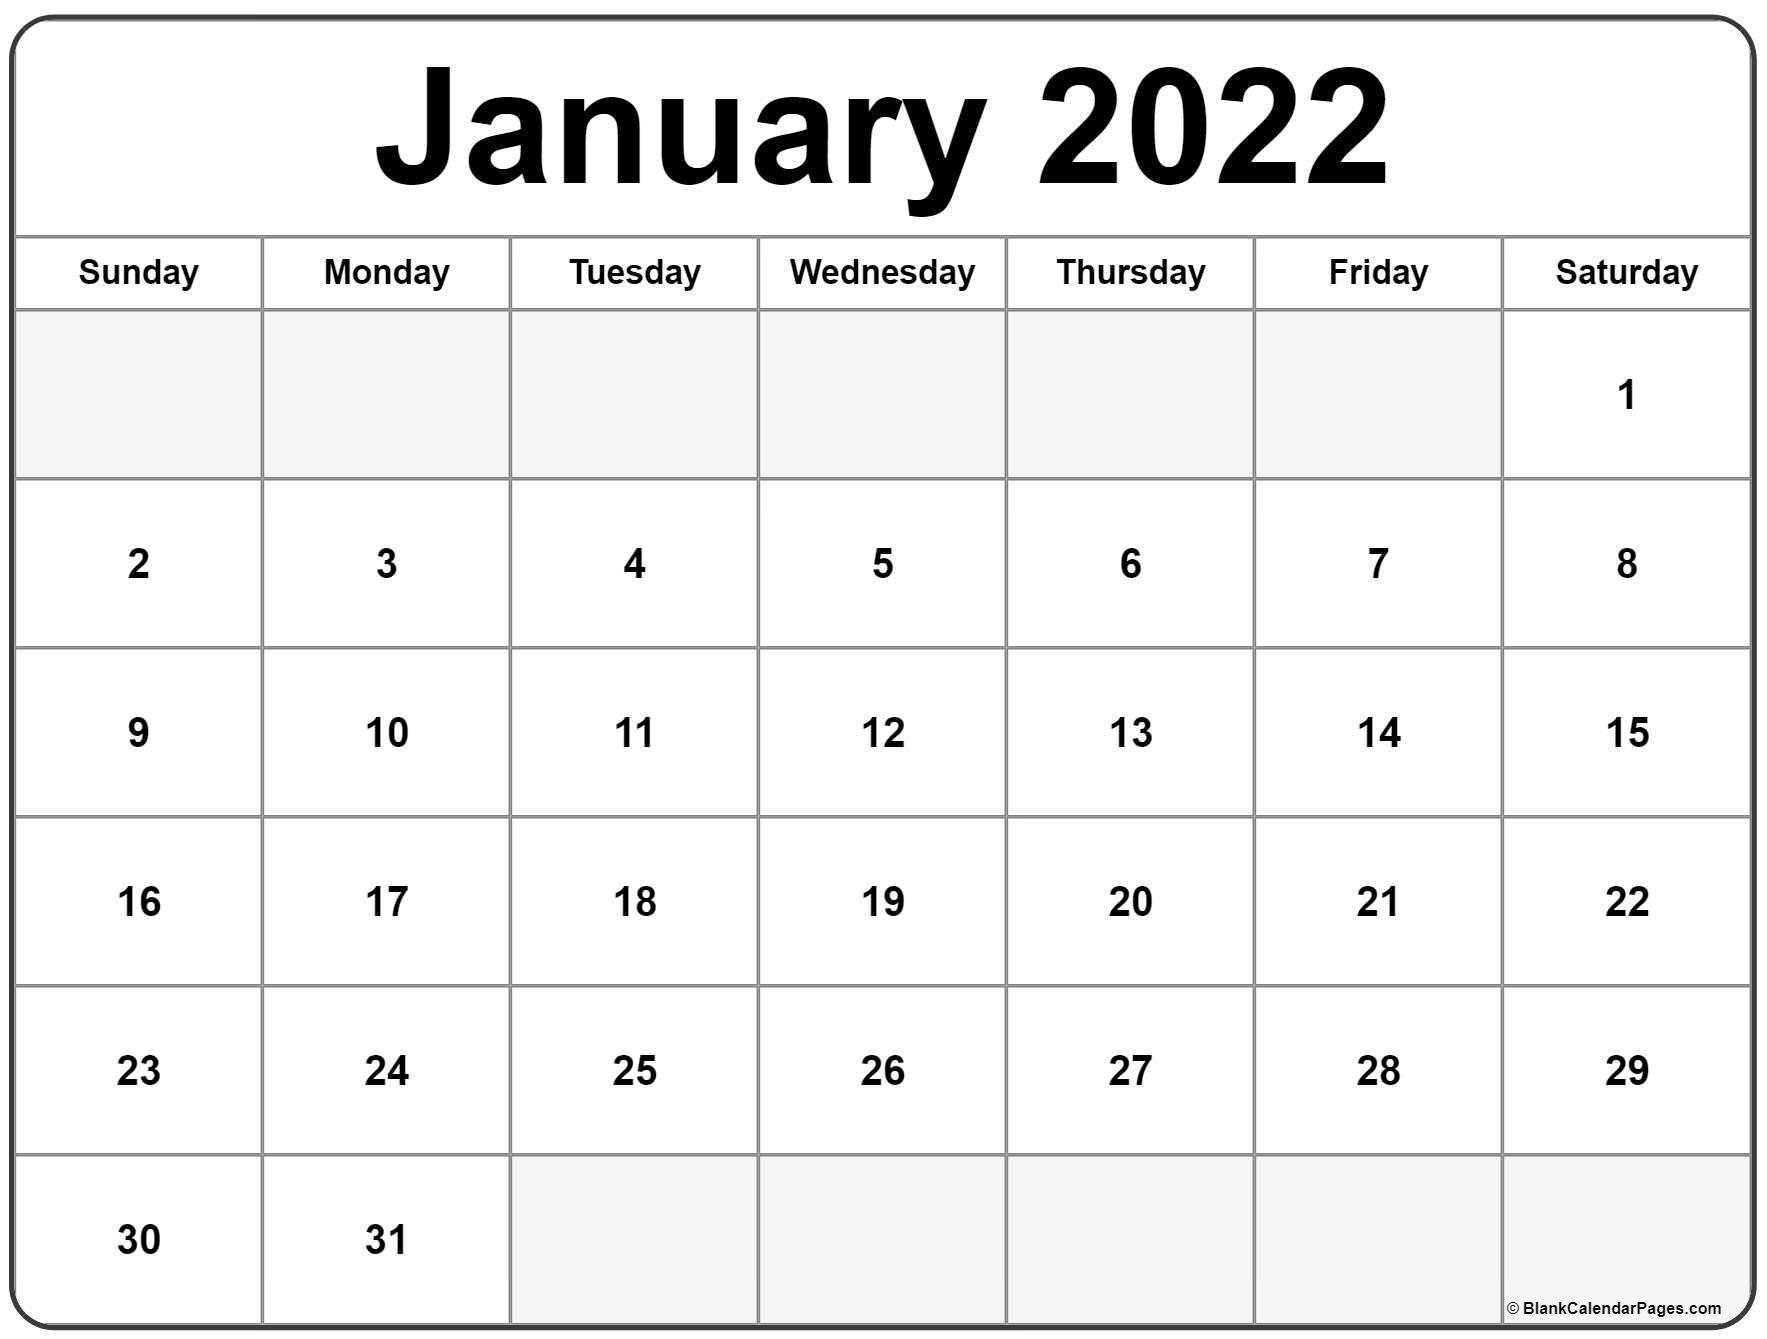 Printable Calendar For January 2022 | PRINTABLE CALENDAR 2021